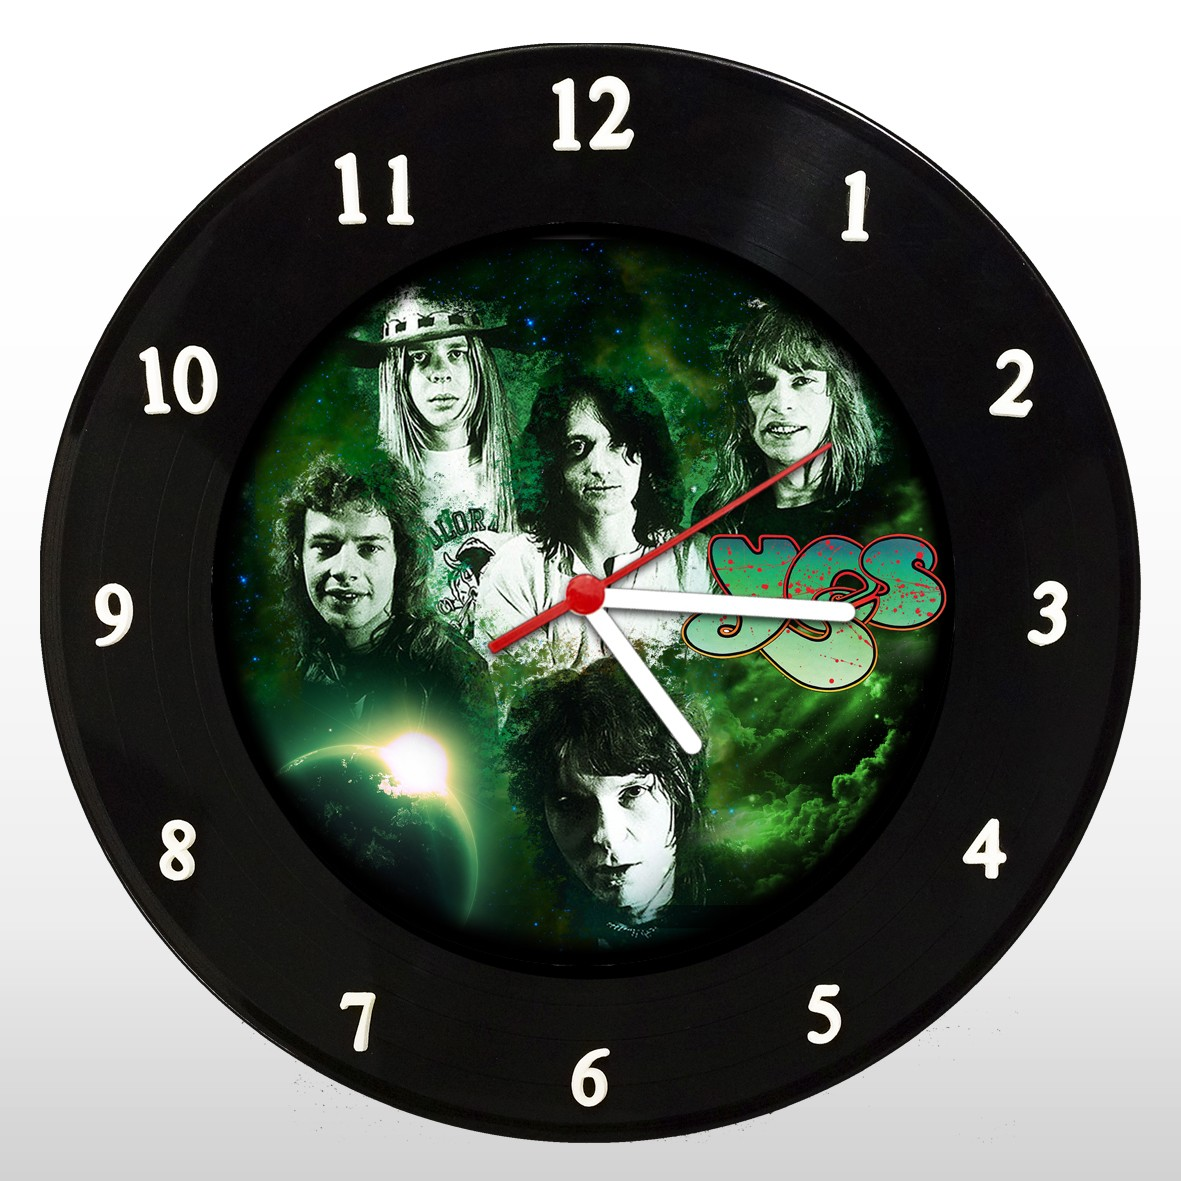 Yes  - Relógio de Parede em Disco de Vinil - Mr. Rock